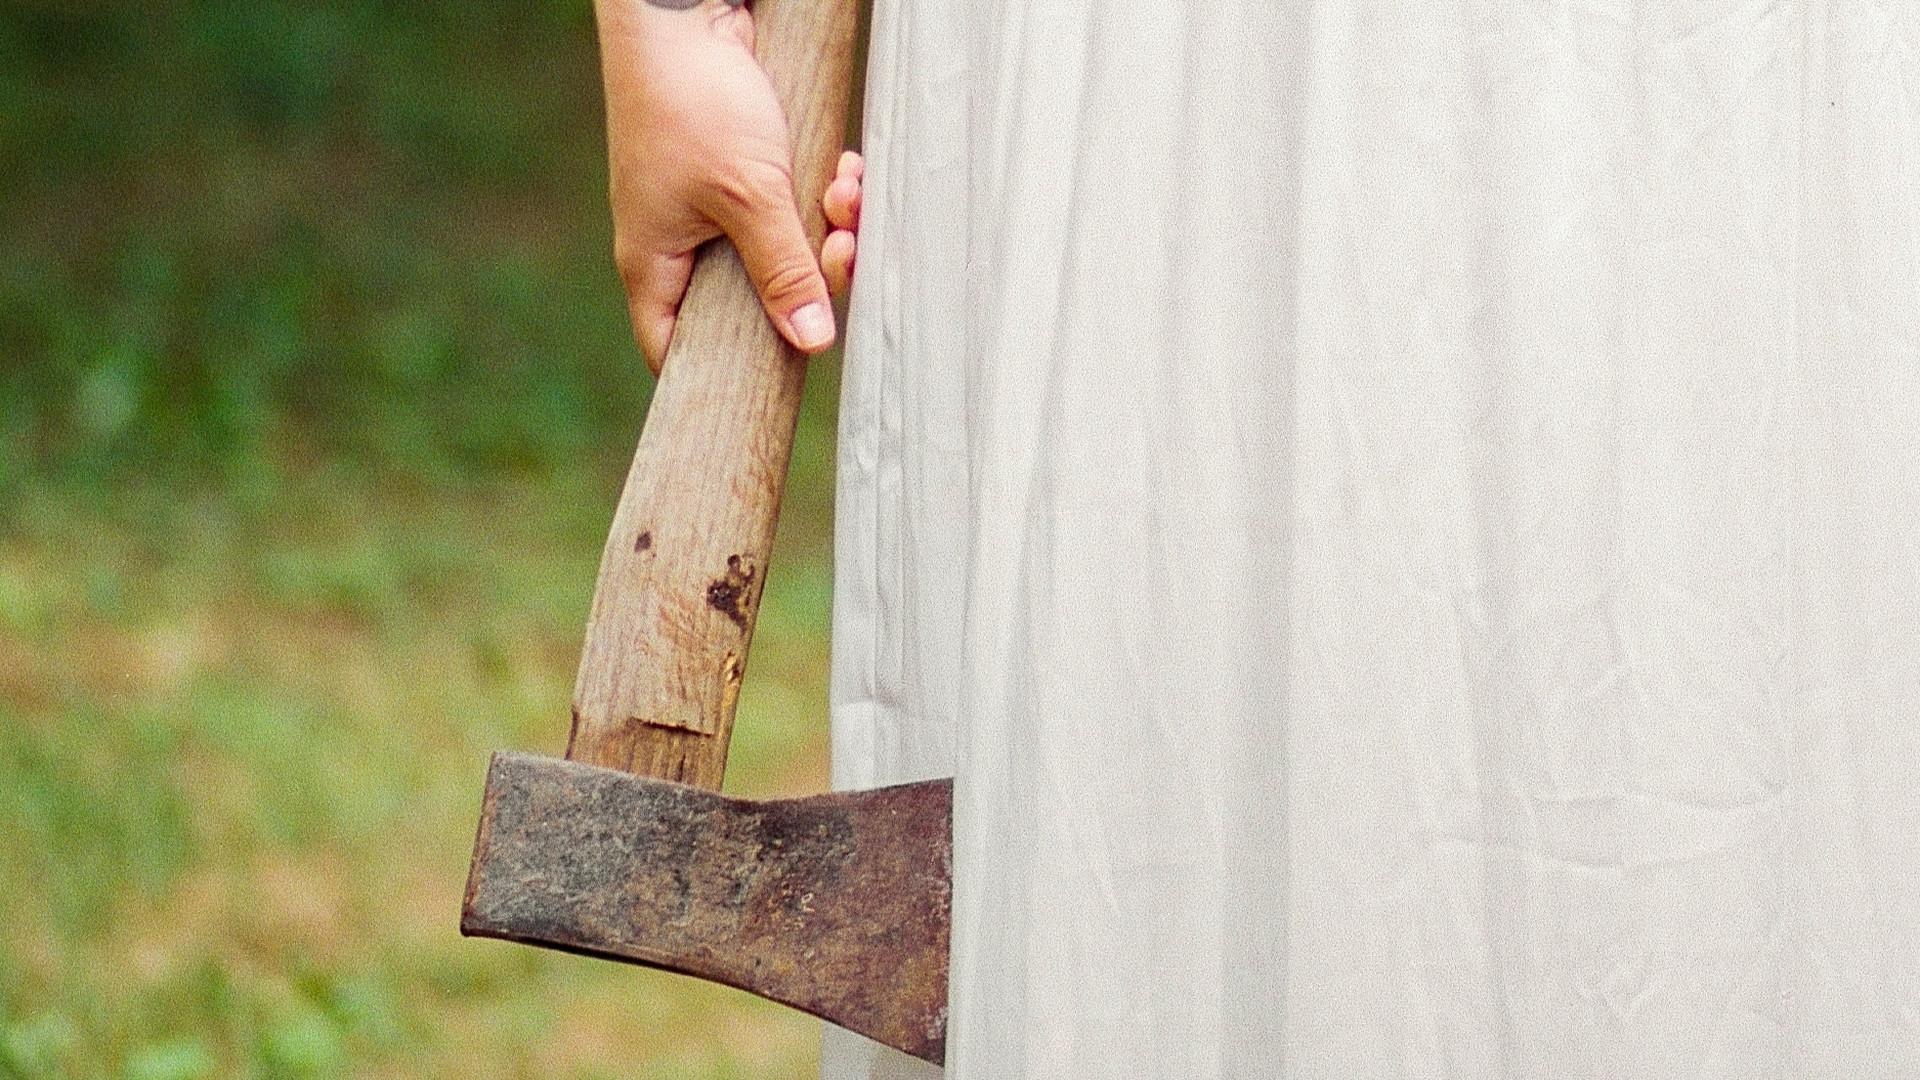 Frau bei Online-Dating getötet Dating traurige Zitate